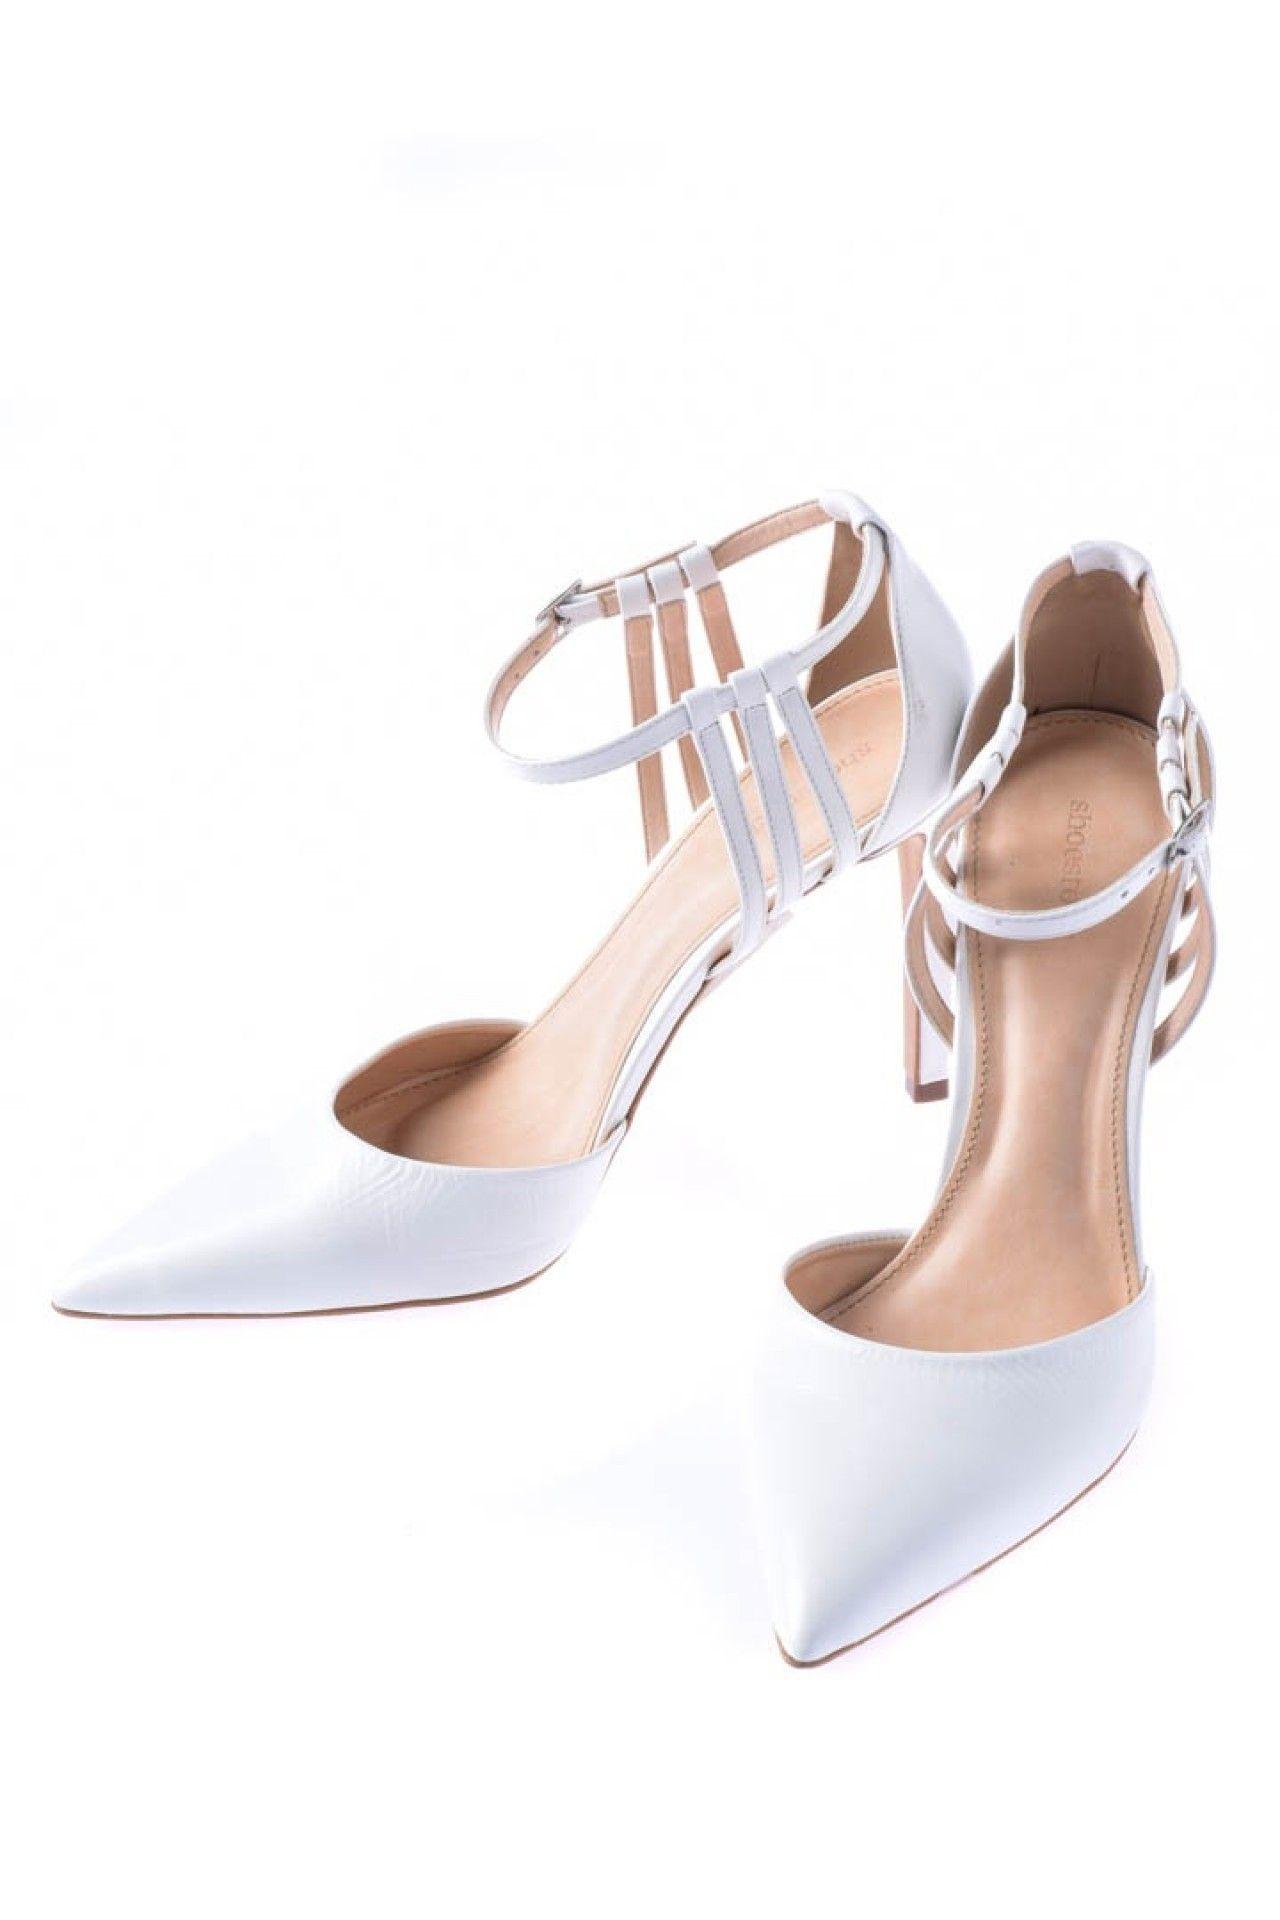 Shoestock - Scarpin Branco Tiras  - Foto 2